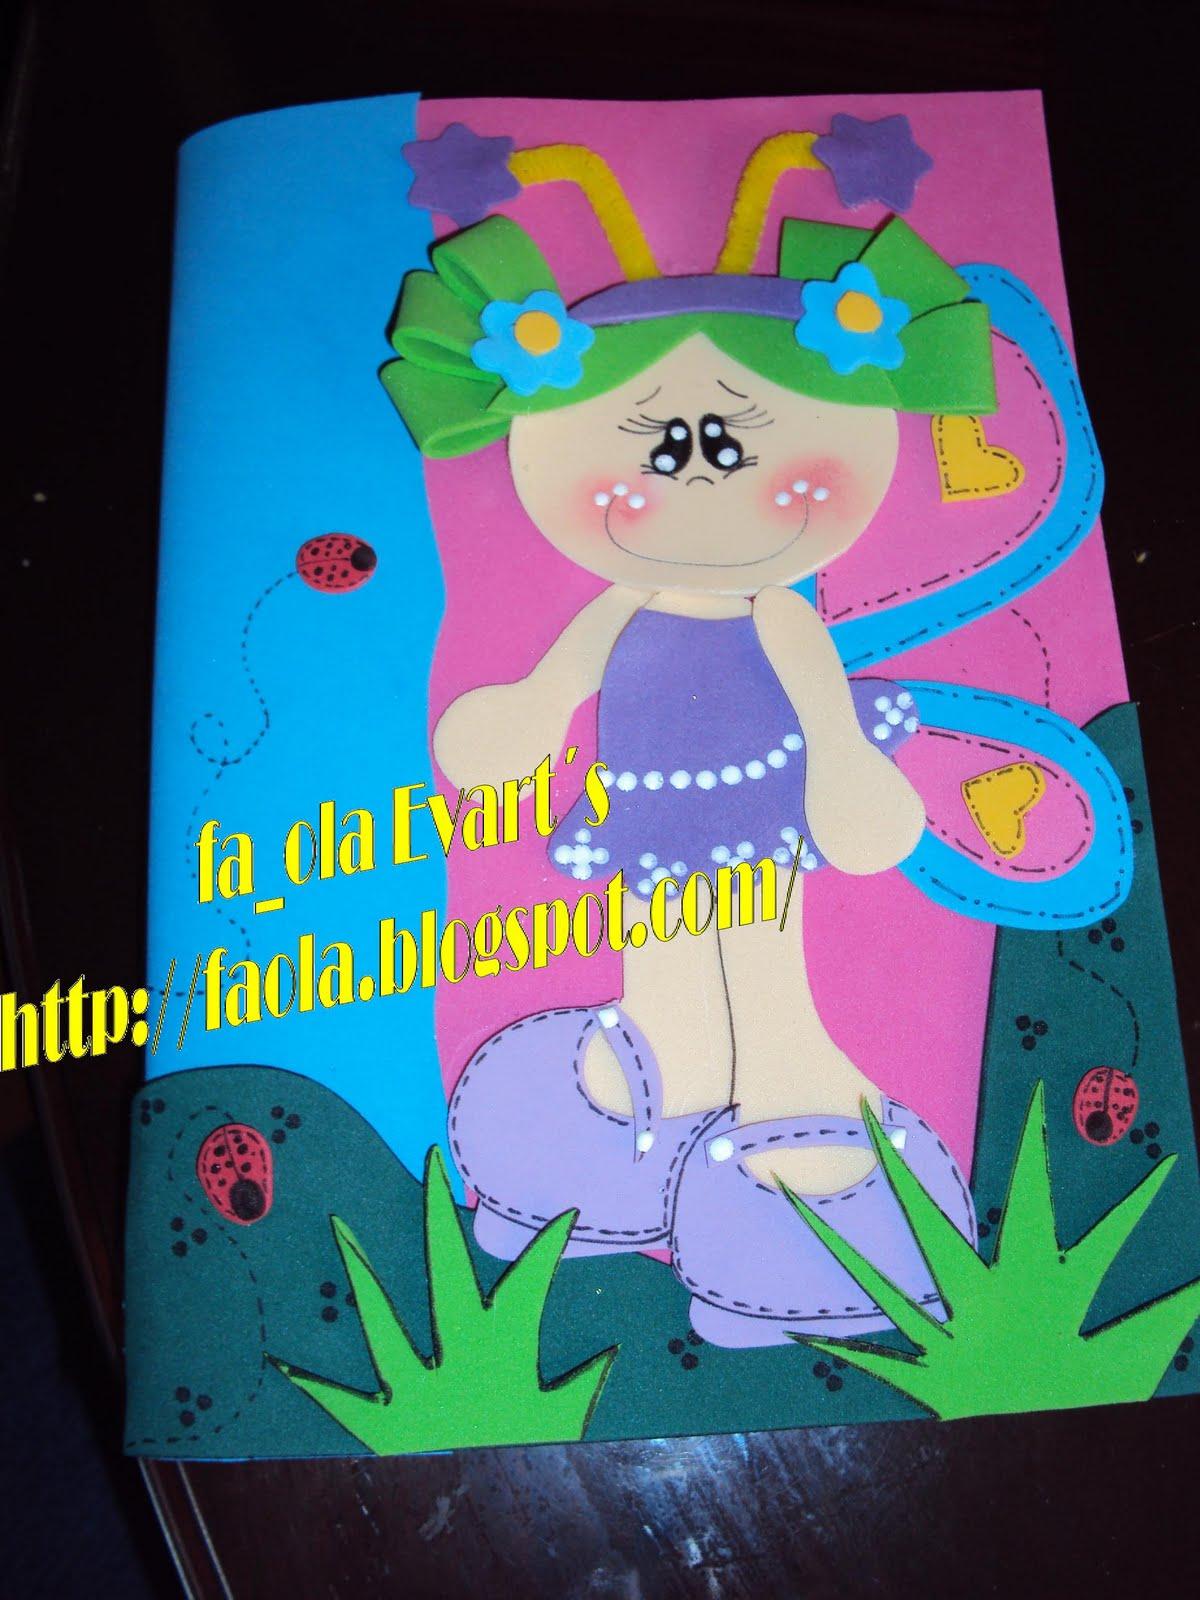 fa_ola evart`s: + Cuadernos decorados con fofuchas planas